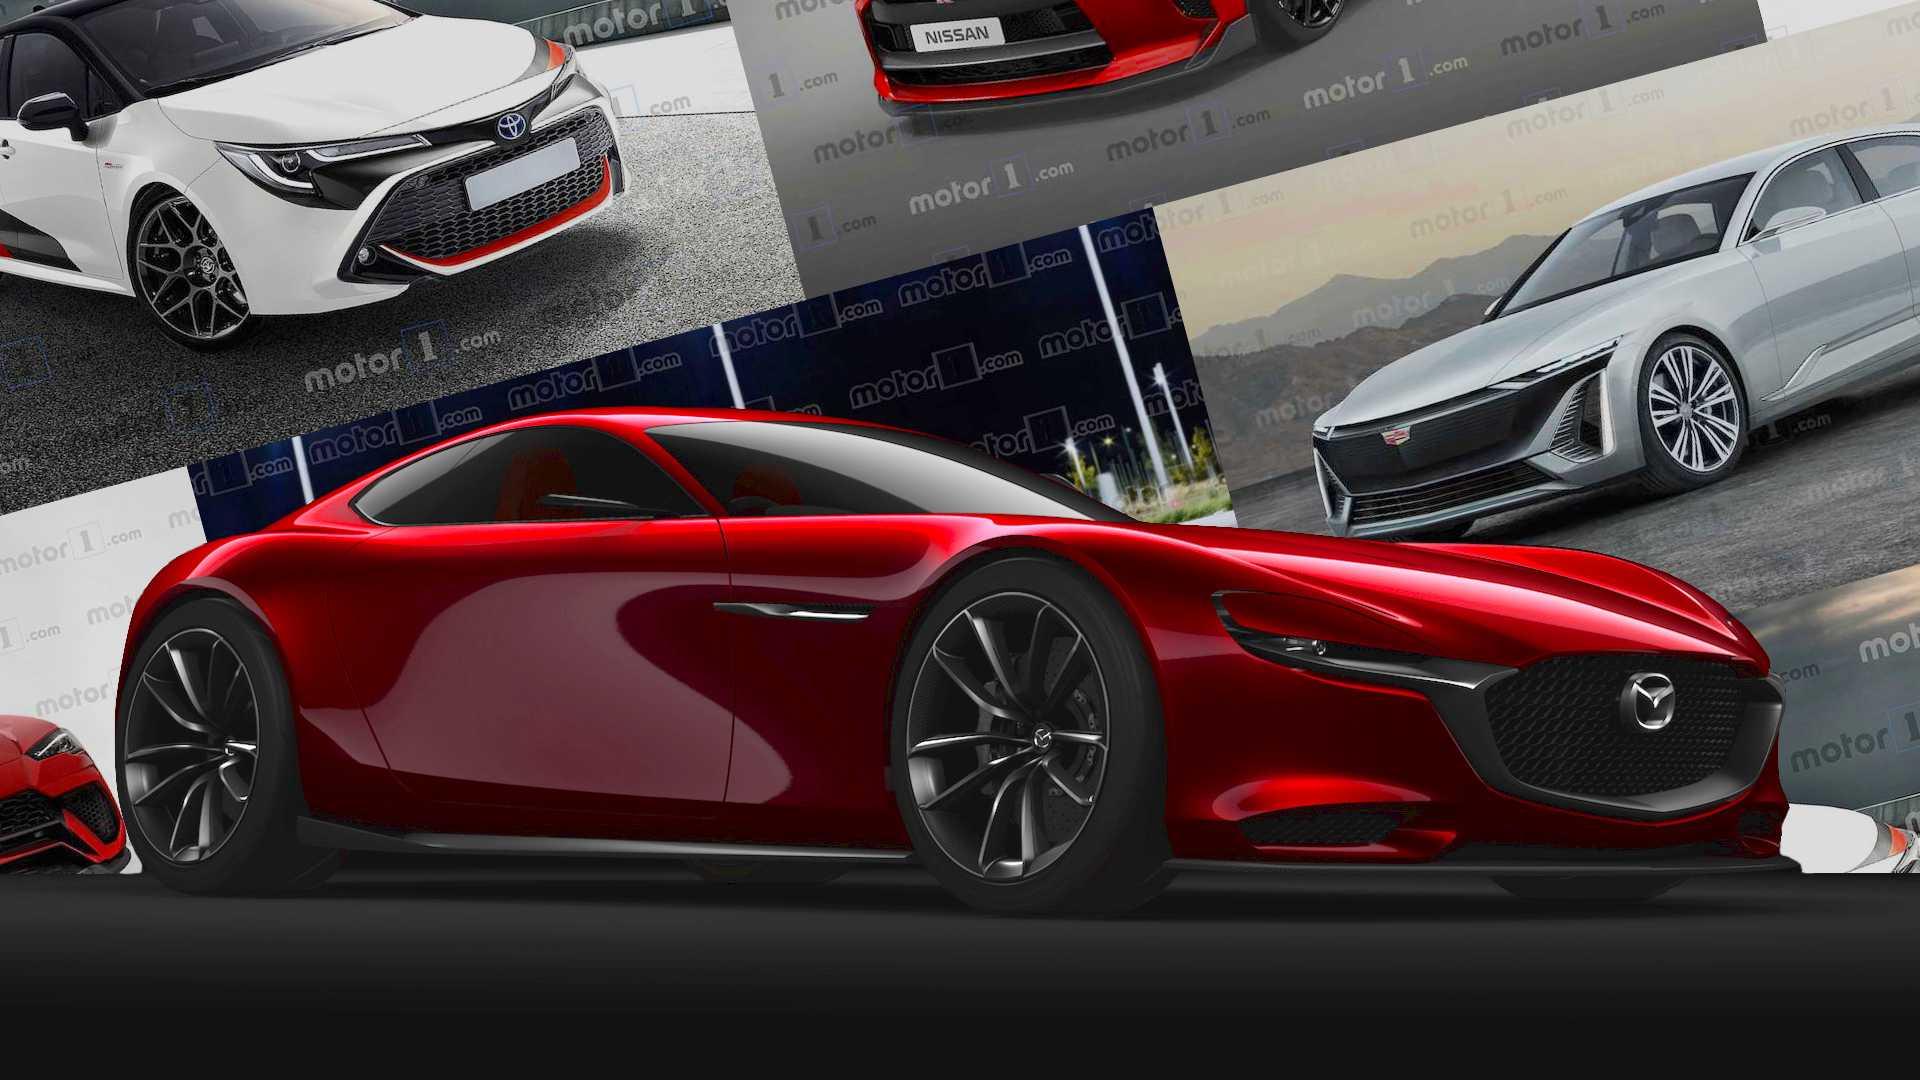 Super Exotic Cars 2021 Wallpapers - Wallpaper Cave